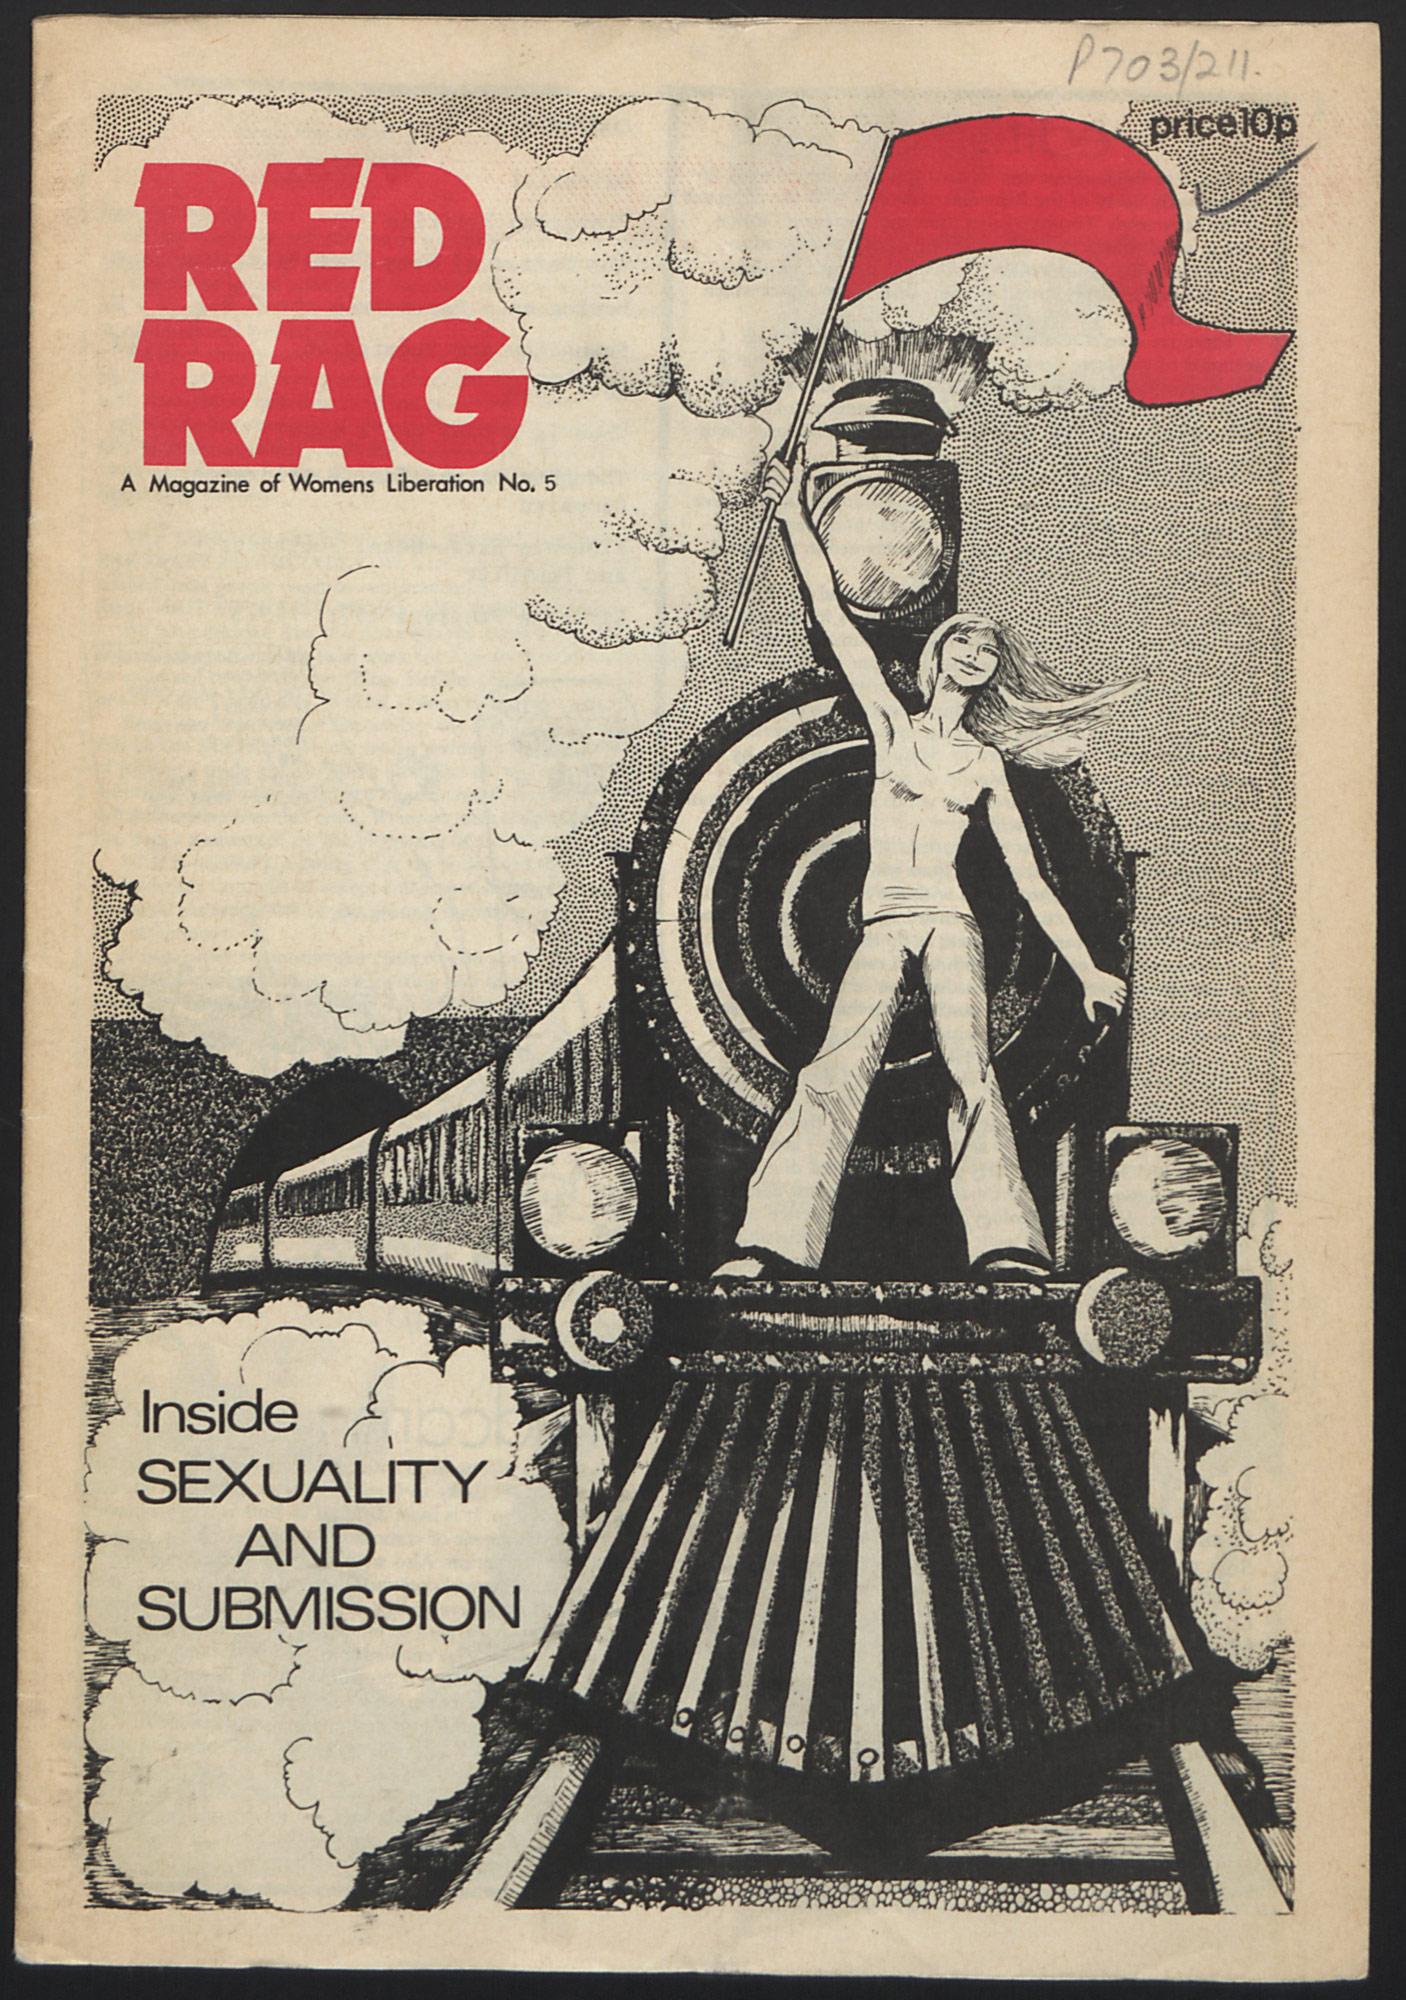 Red Rag magazine 1973 issue 5